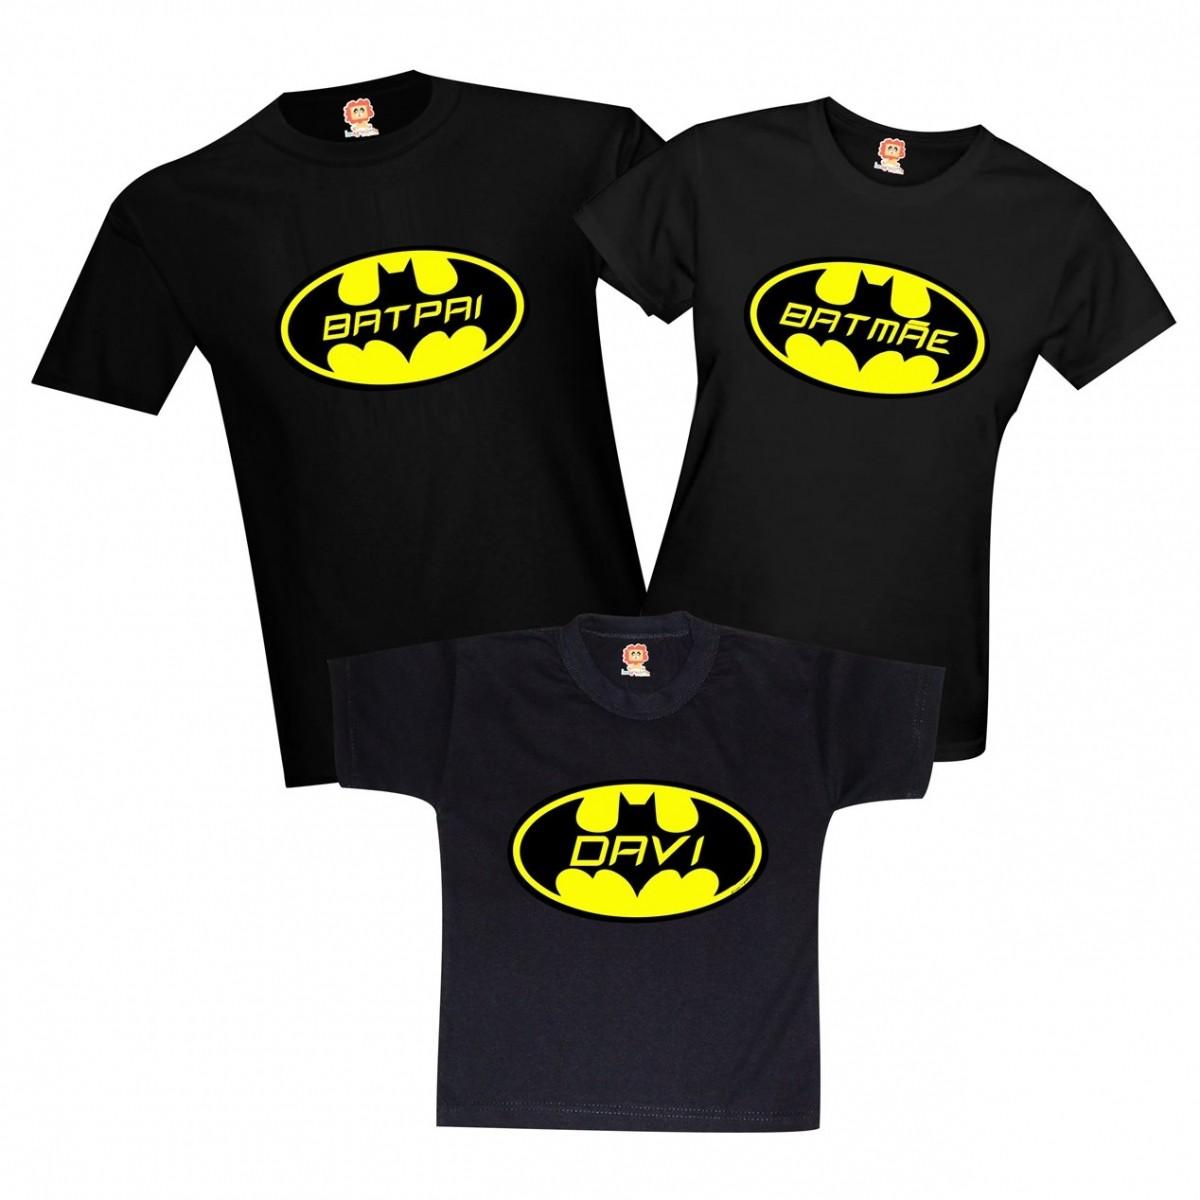 Camisetas BATPAI - BATMÃE - BATFILHO